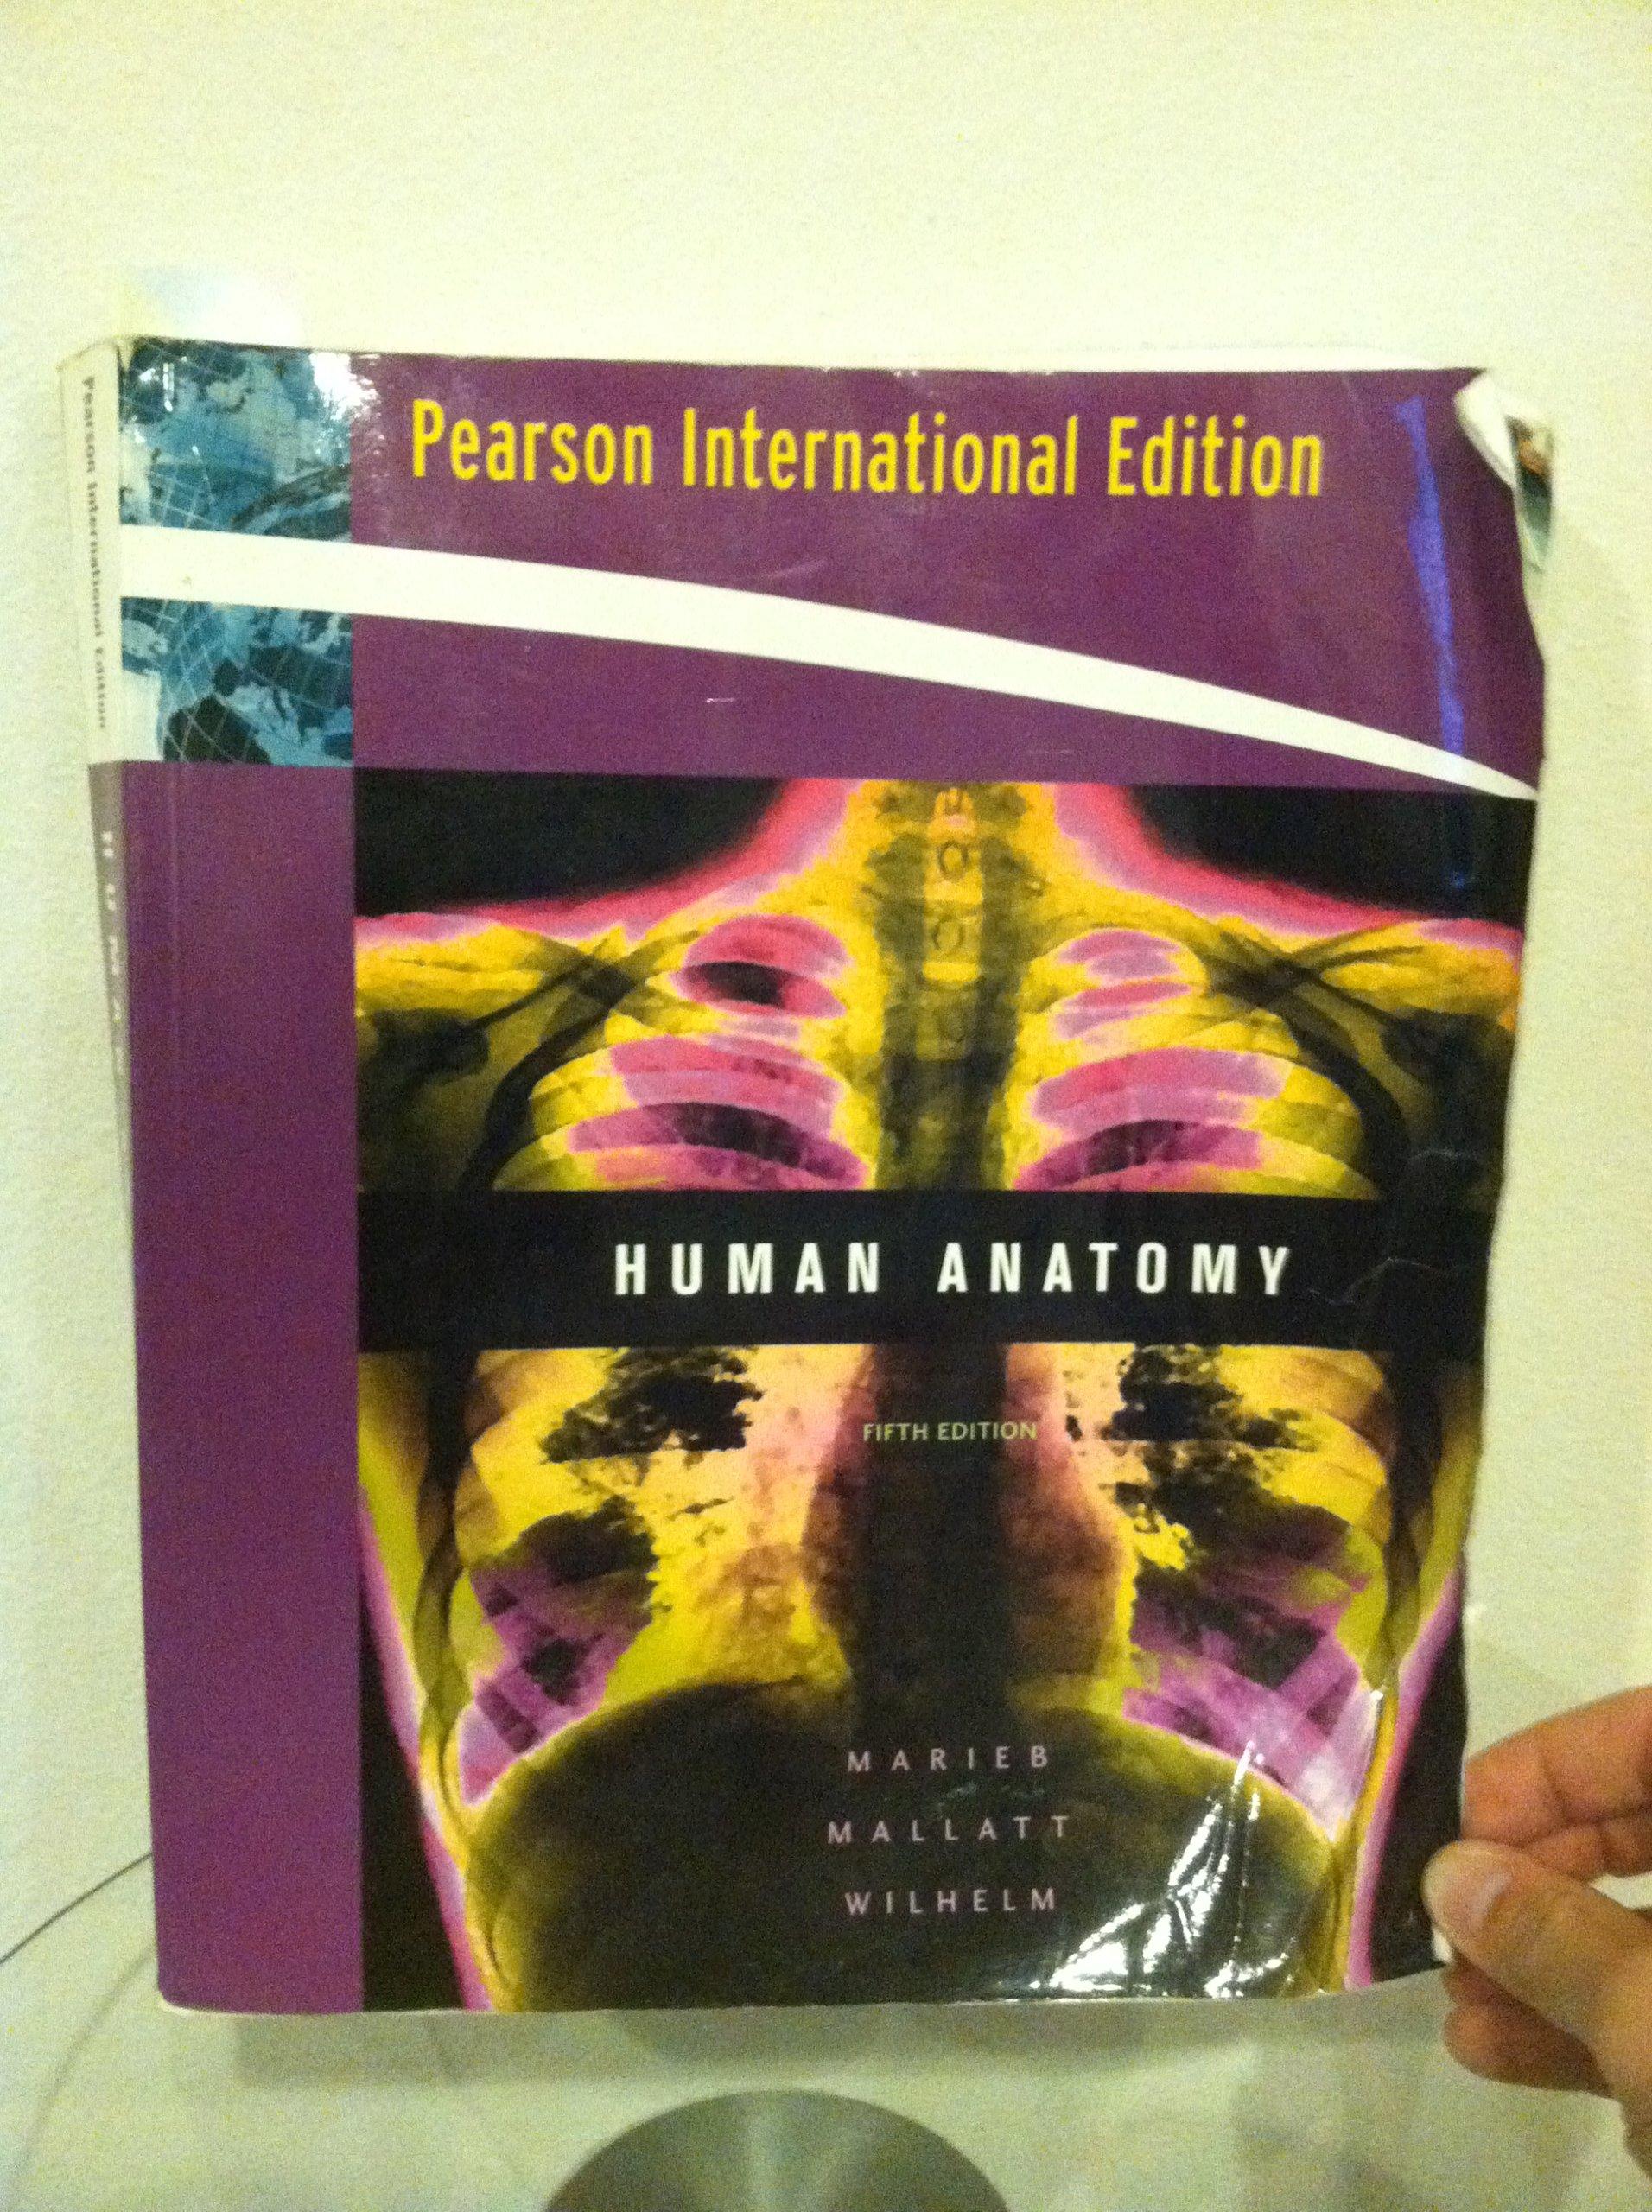 Human Anatomy 5th Edition Fifth Edtion By Marieb Mallatt And